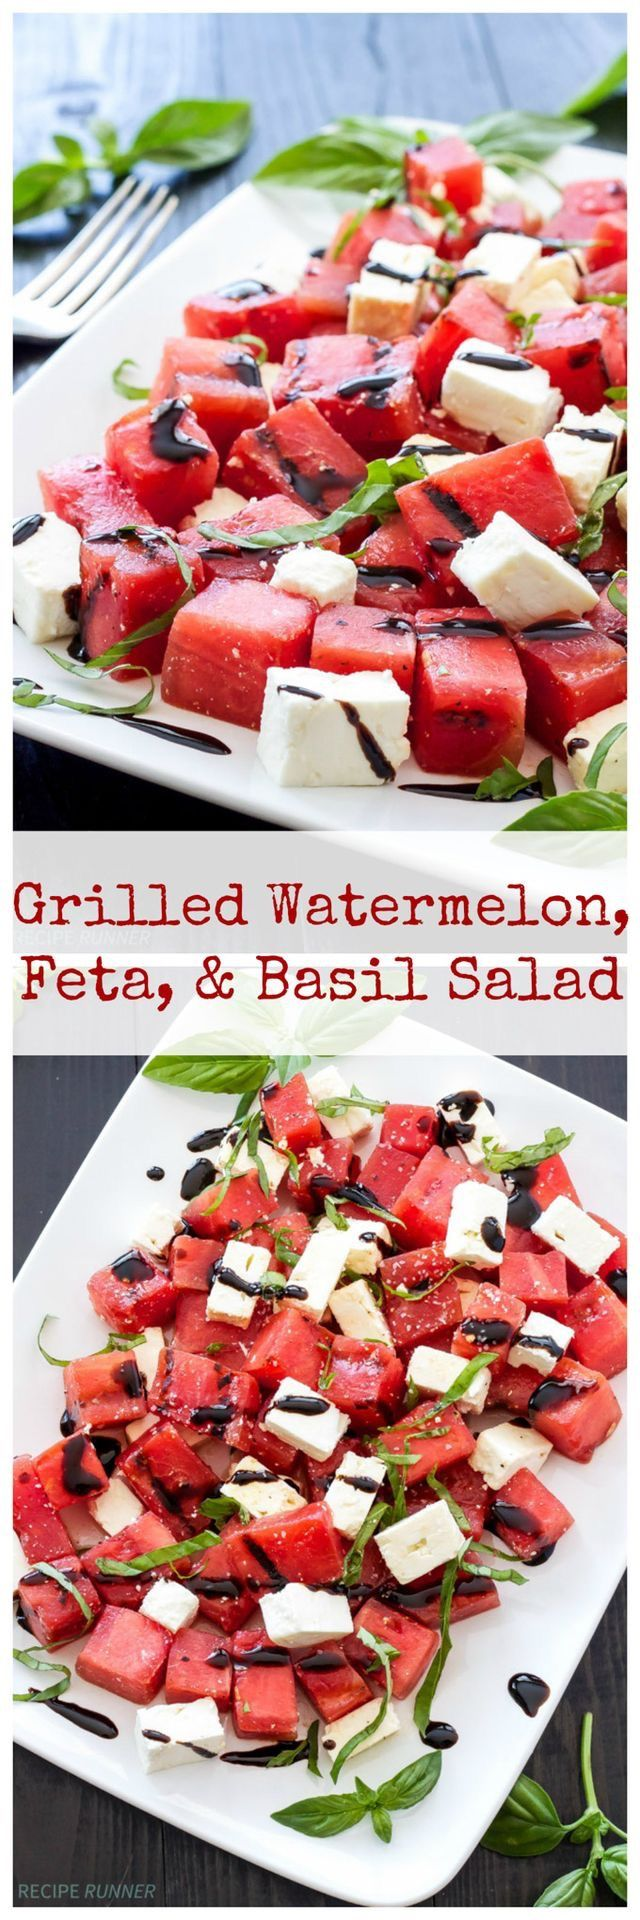 Grilled watermelon, feta and basil salad